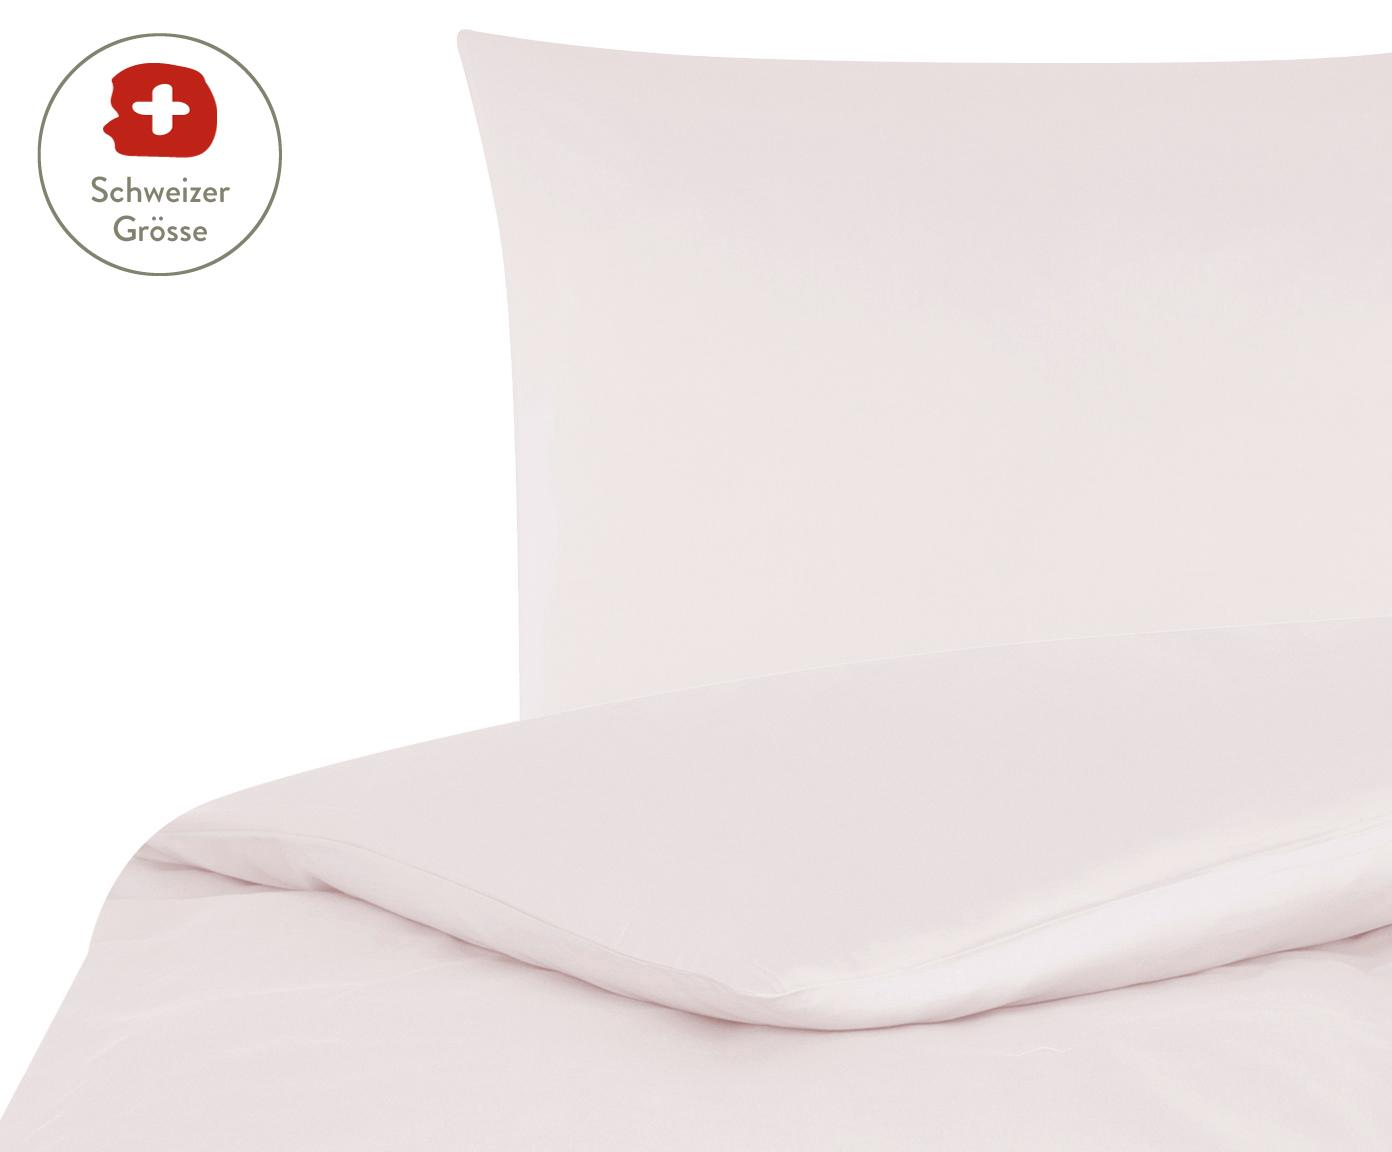 Baumwollsatin-Bettdeckenbezug Comfort in Rosa, Webart: Satin, leicht glänzend, Rosa, 160 x 210 cm